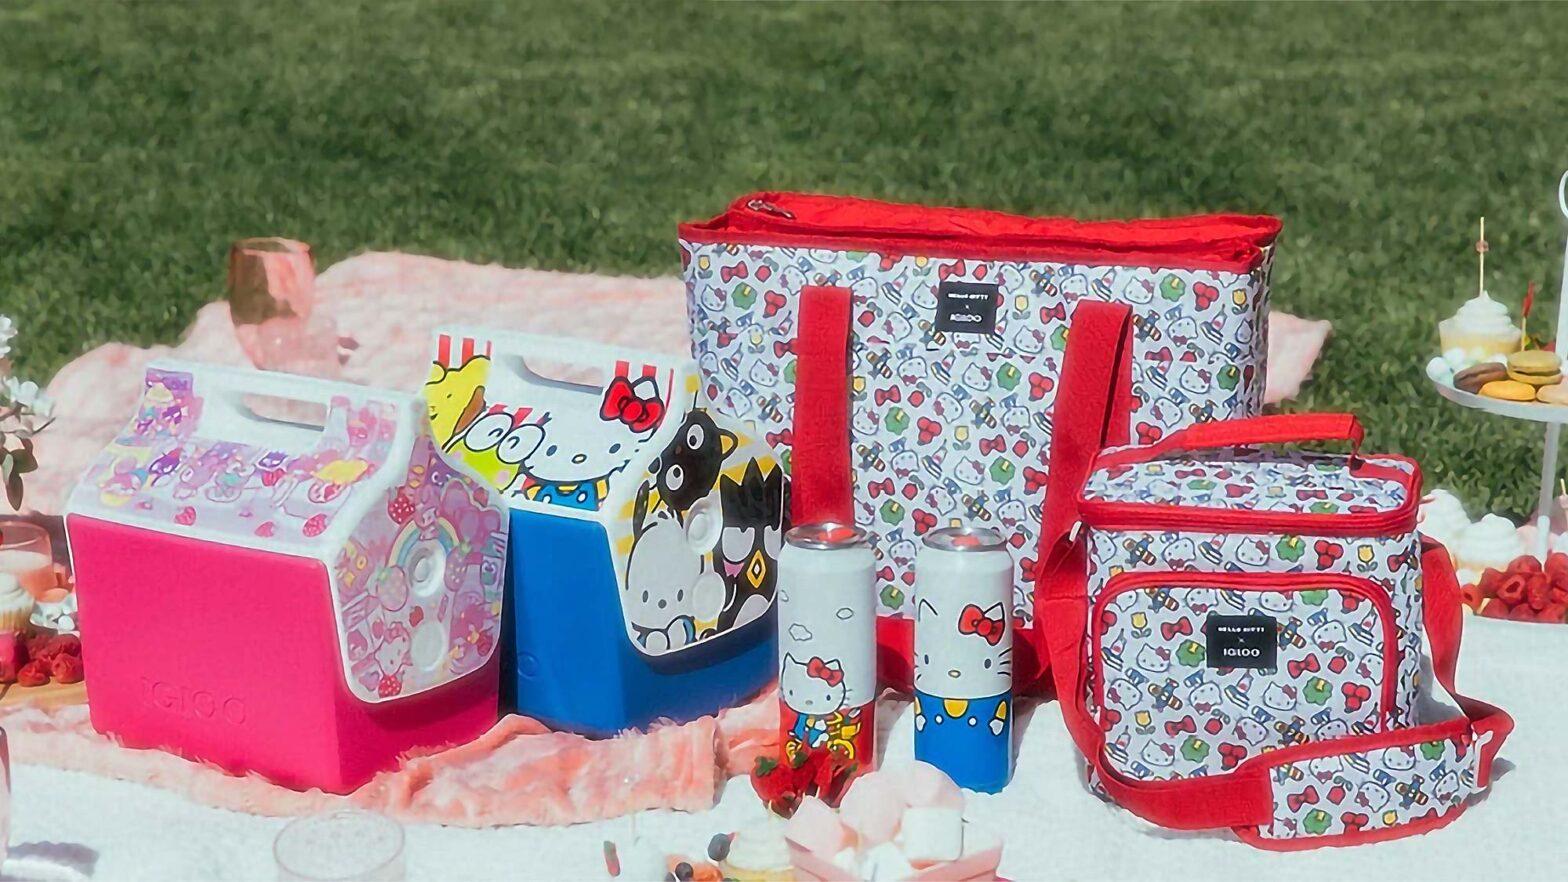 Igloo x Hello Kitty Cooler Collection